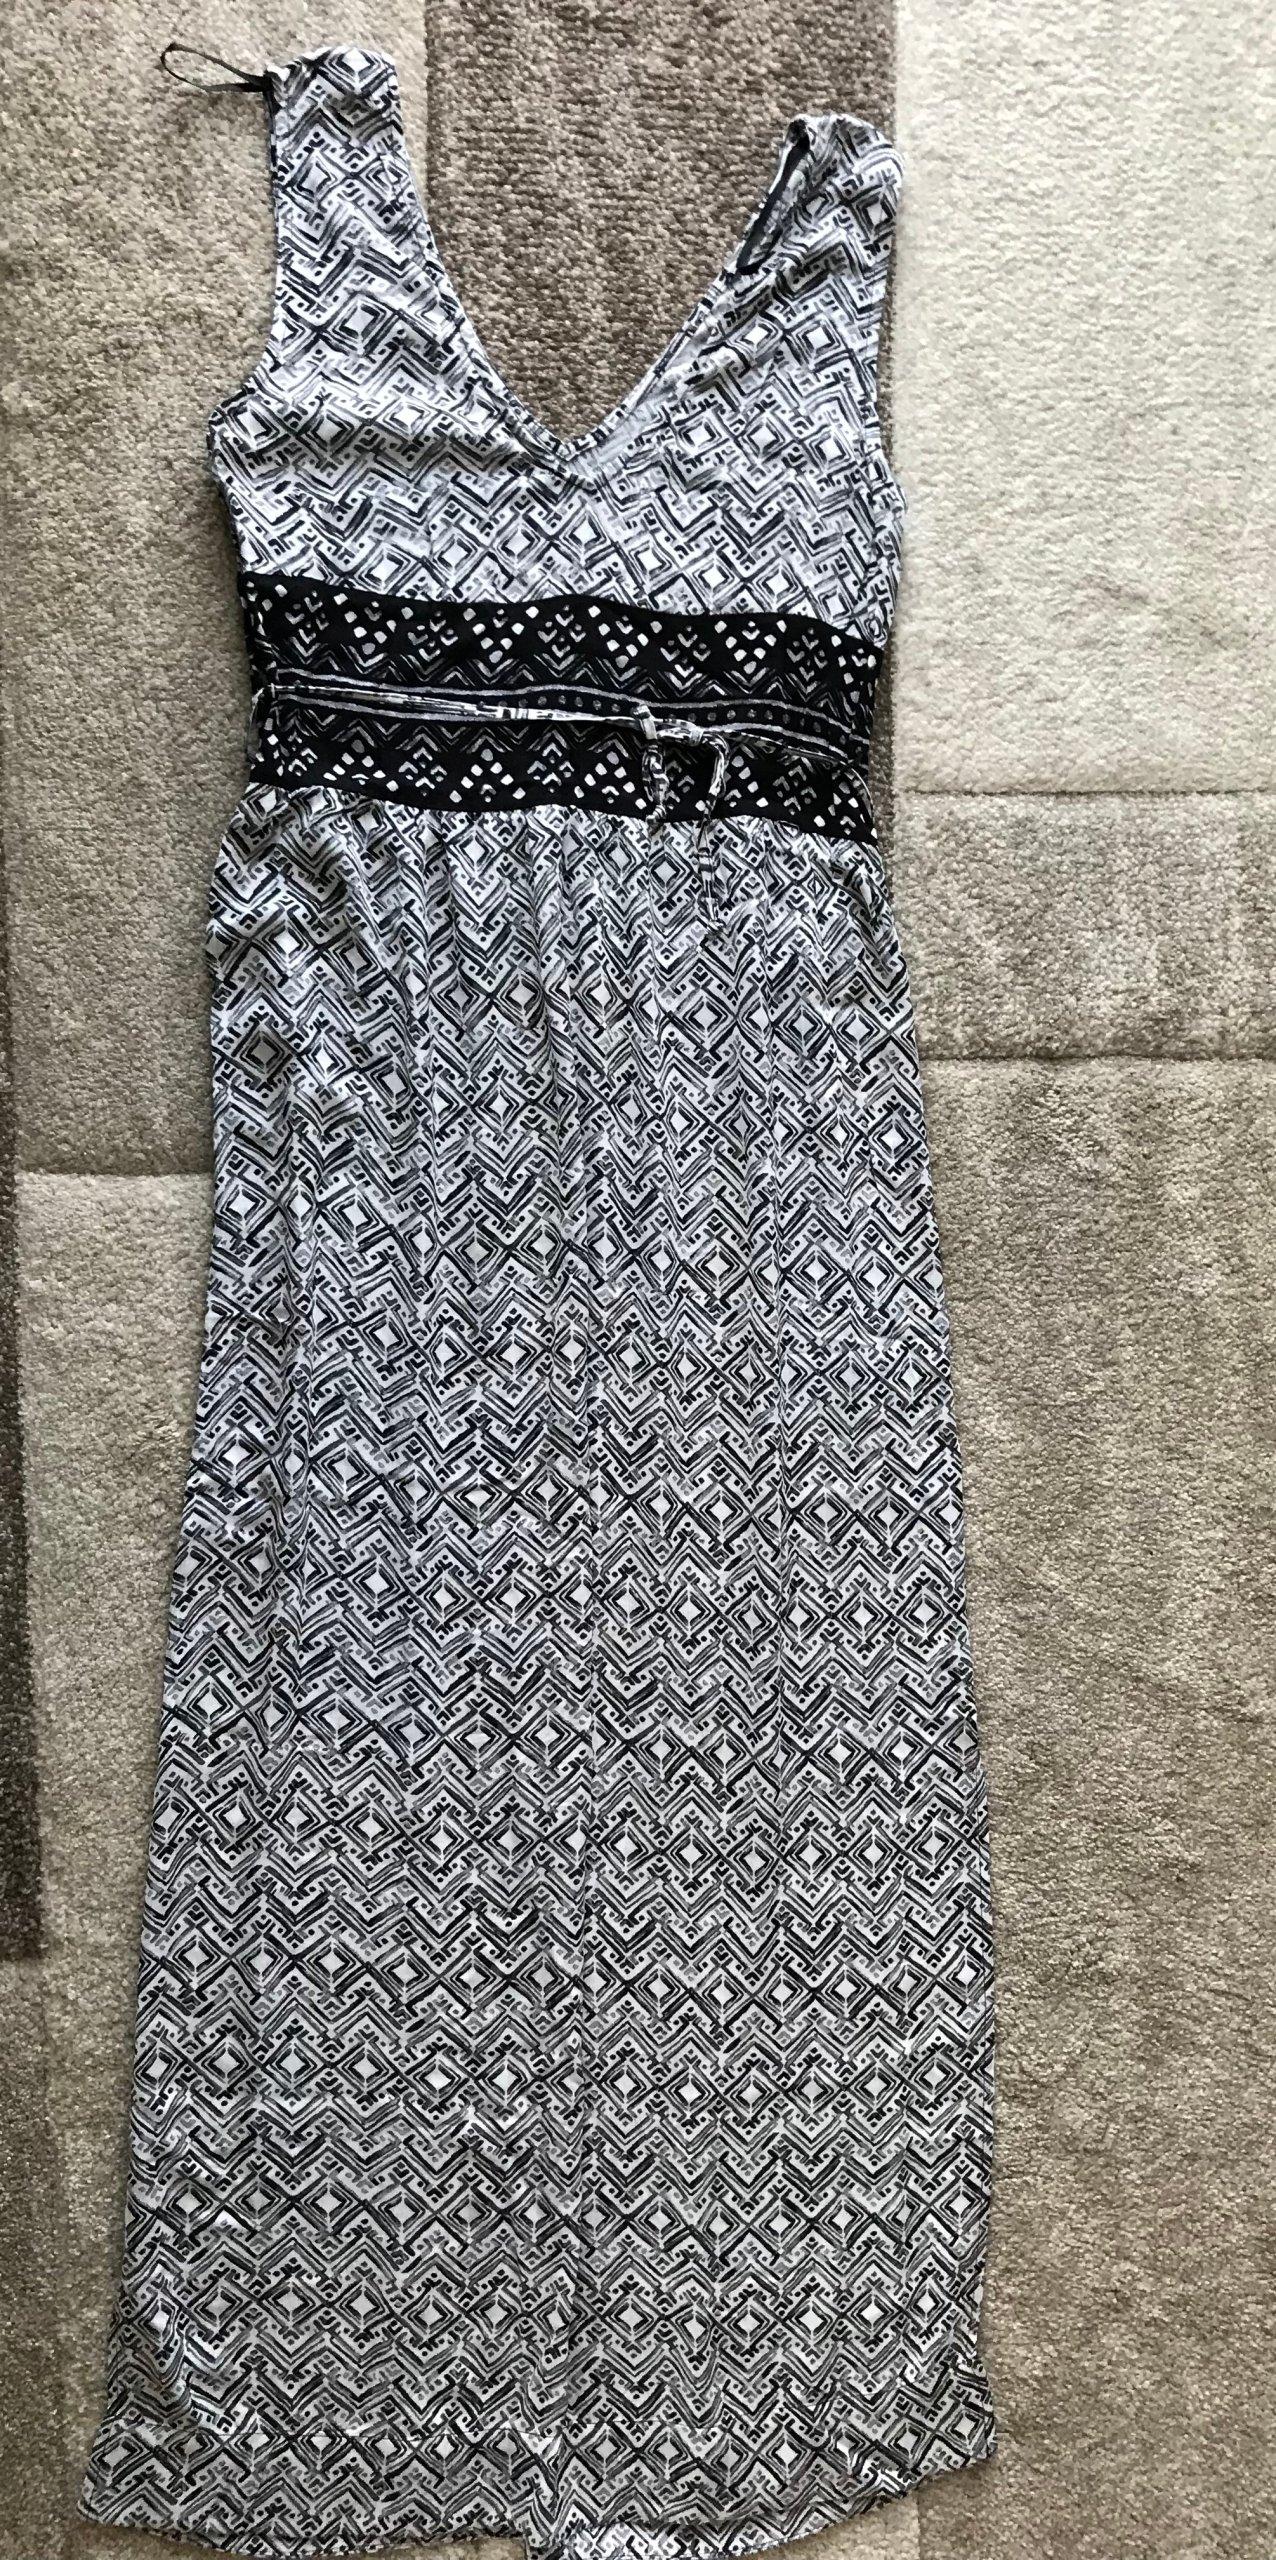 bcd38e9c30 BONPRIX sukienka maxi M - 7451344834 - oficjalne archiwum allegro